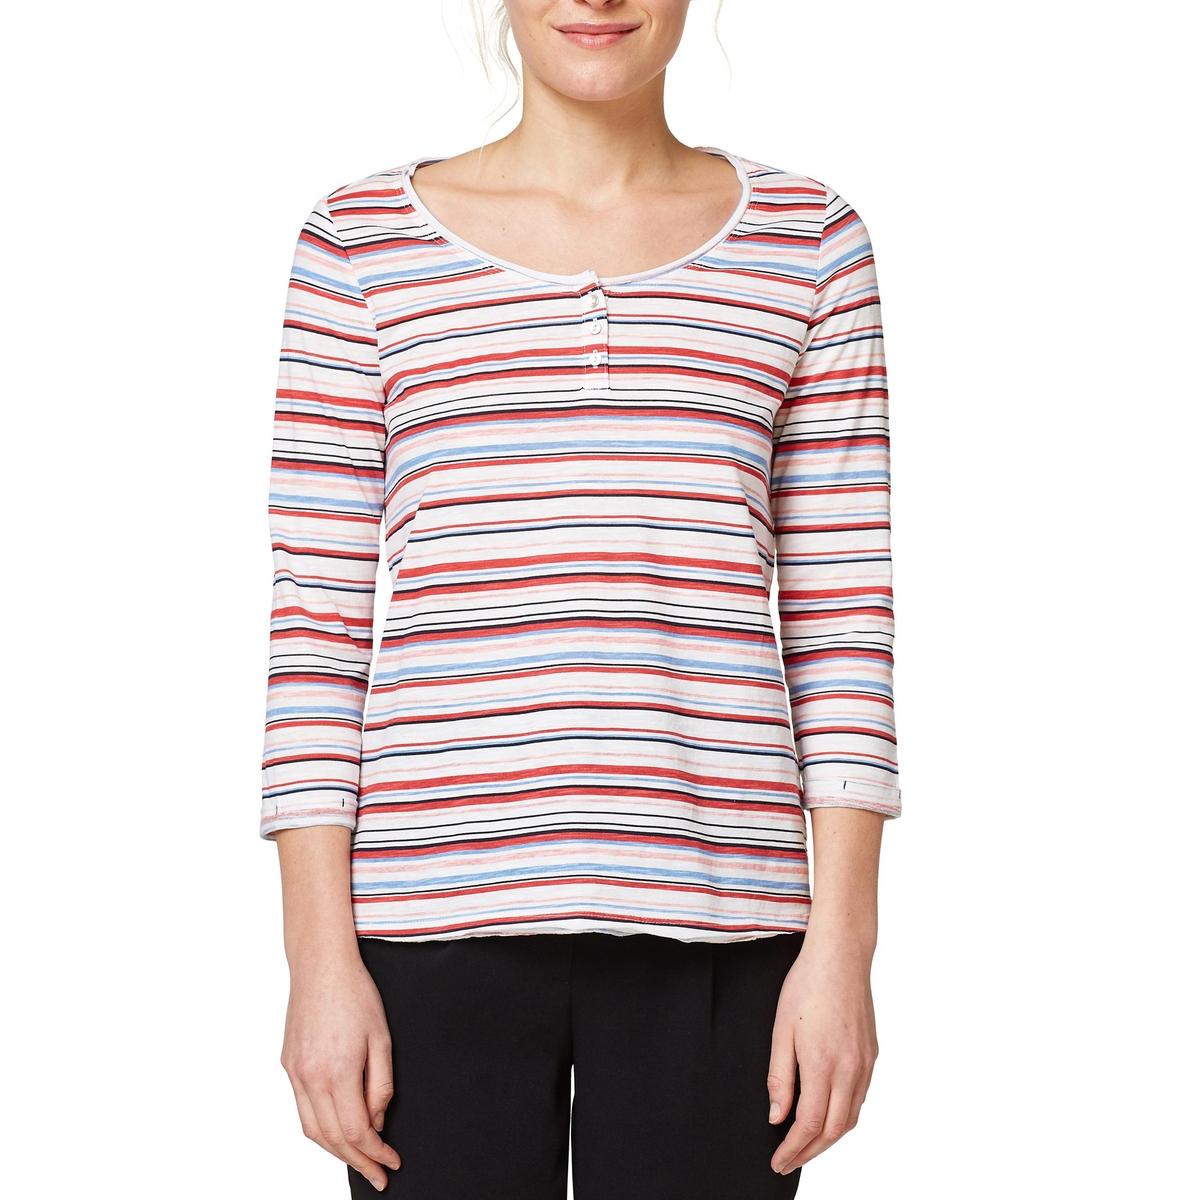 Camiseta a rayas, cuello redondo con botones, 100% algodón